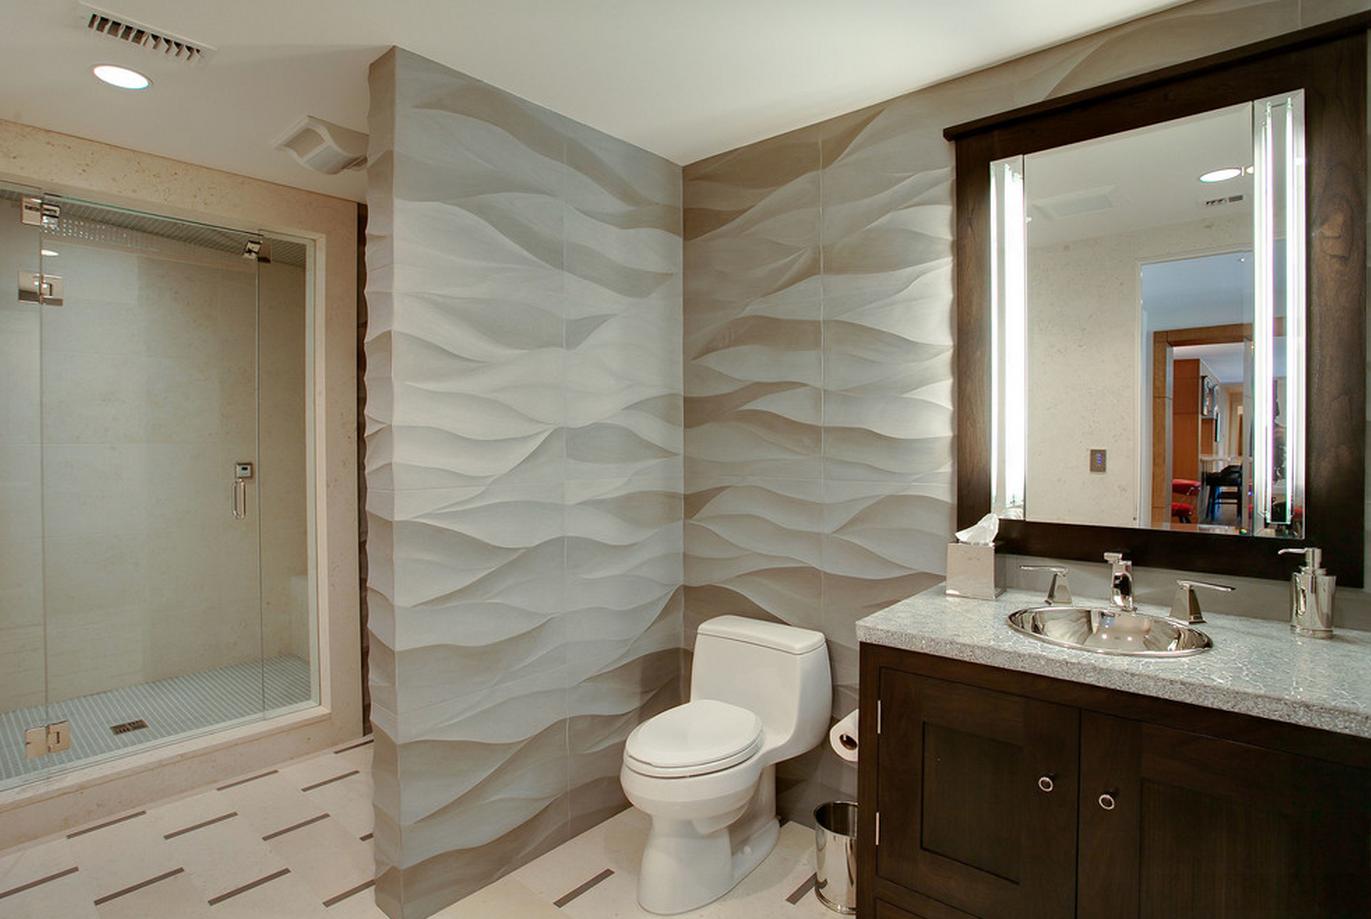 Ремонт туалета панелями фактурными